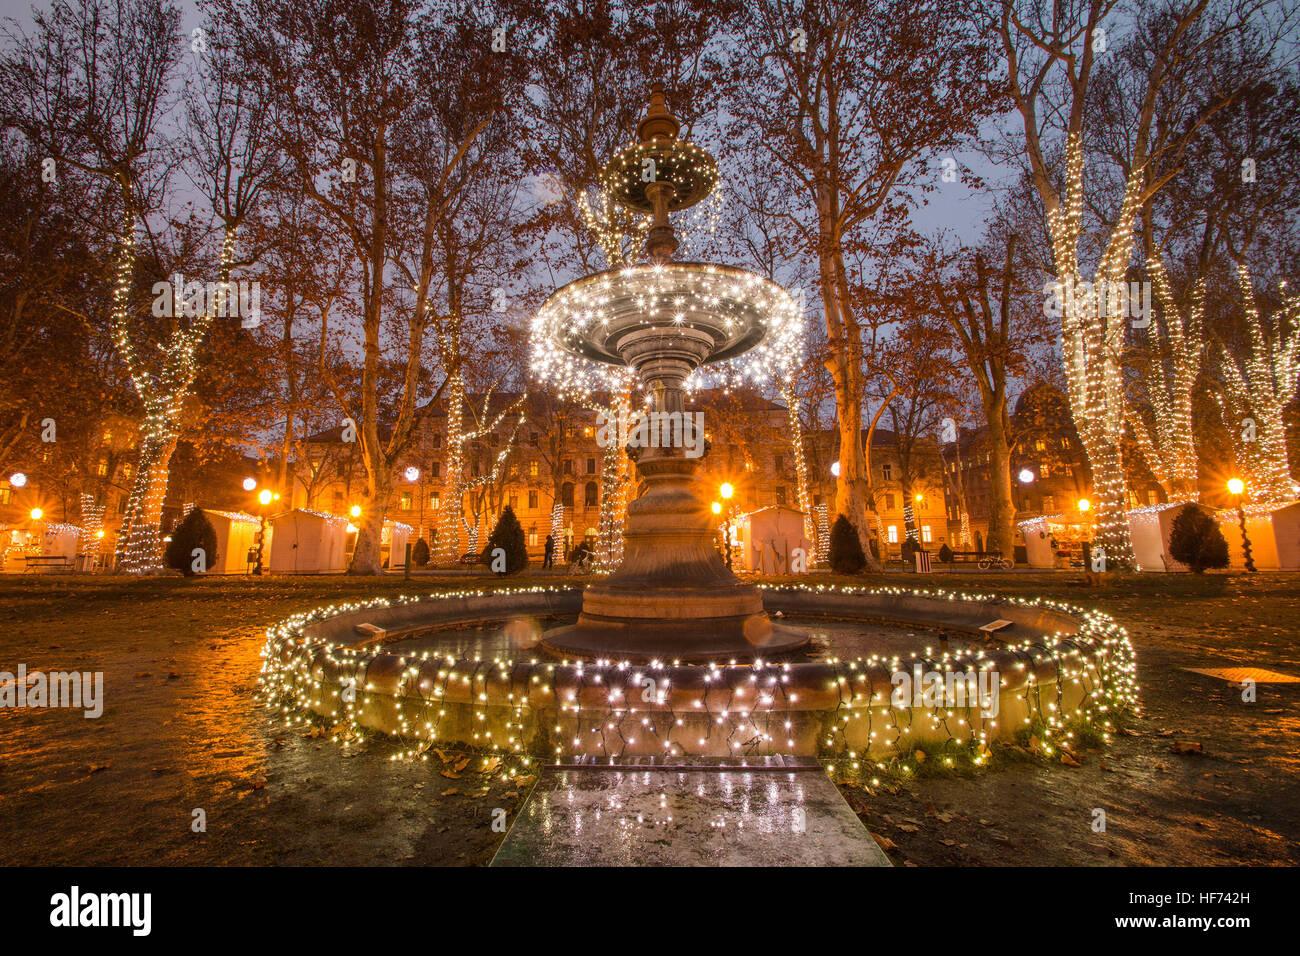 Illuminated Fountain In Zrinjevac Park Zagreb Croatia Christmas Stock Photo Alamy